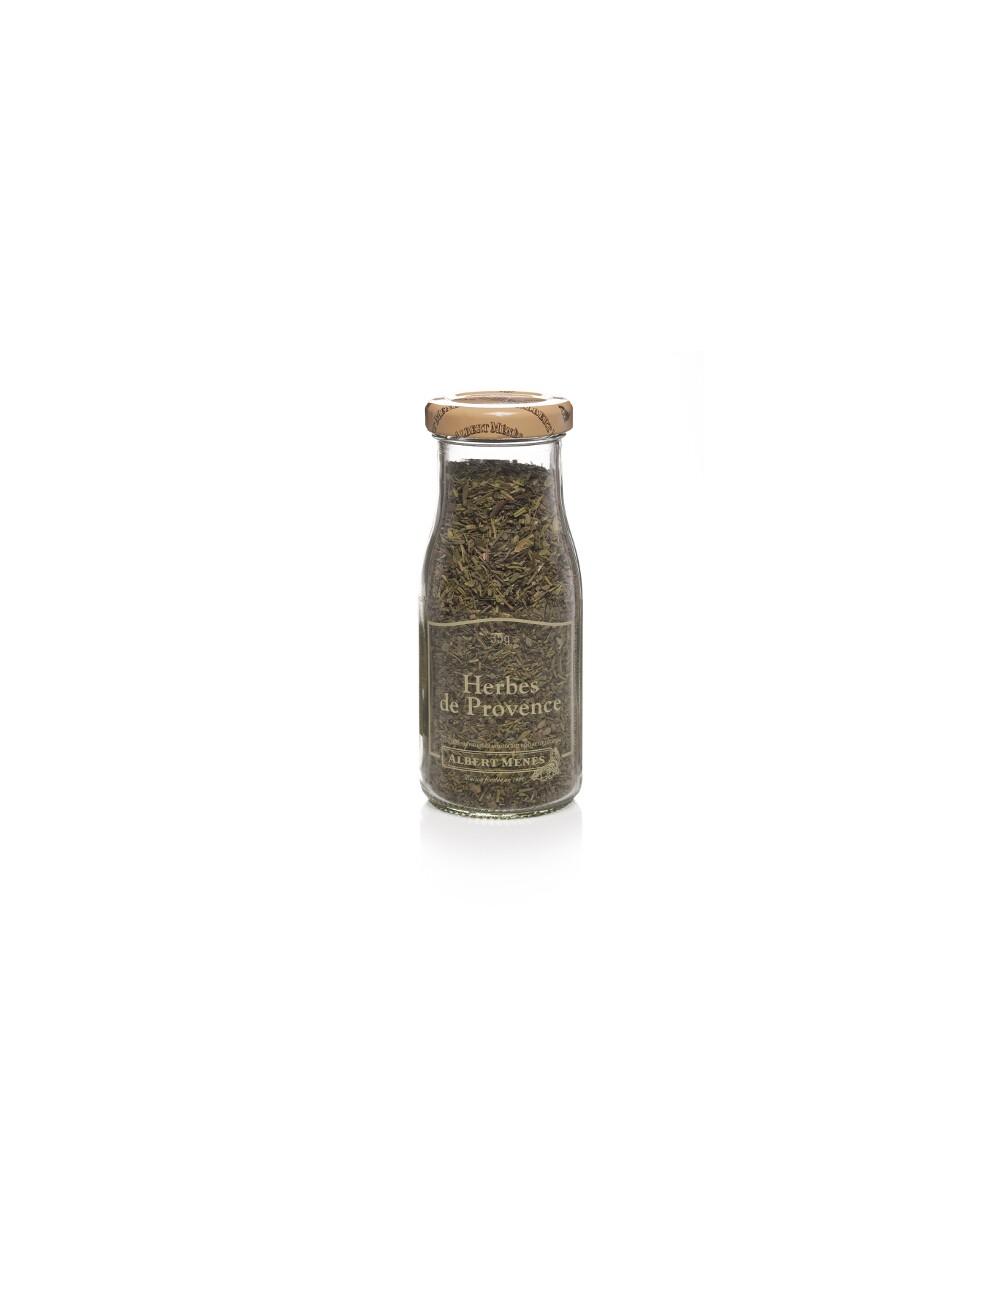 Herbes de Provence 35 g